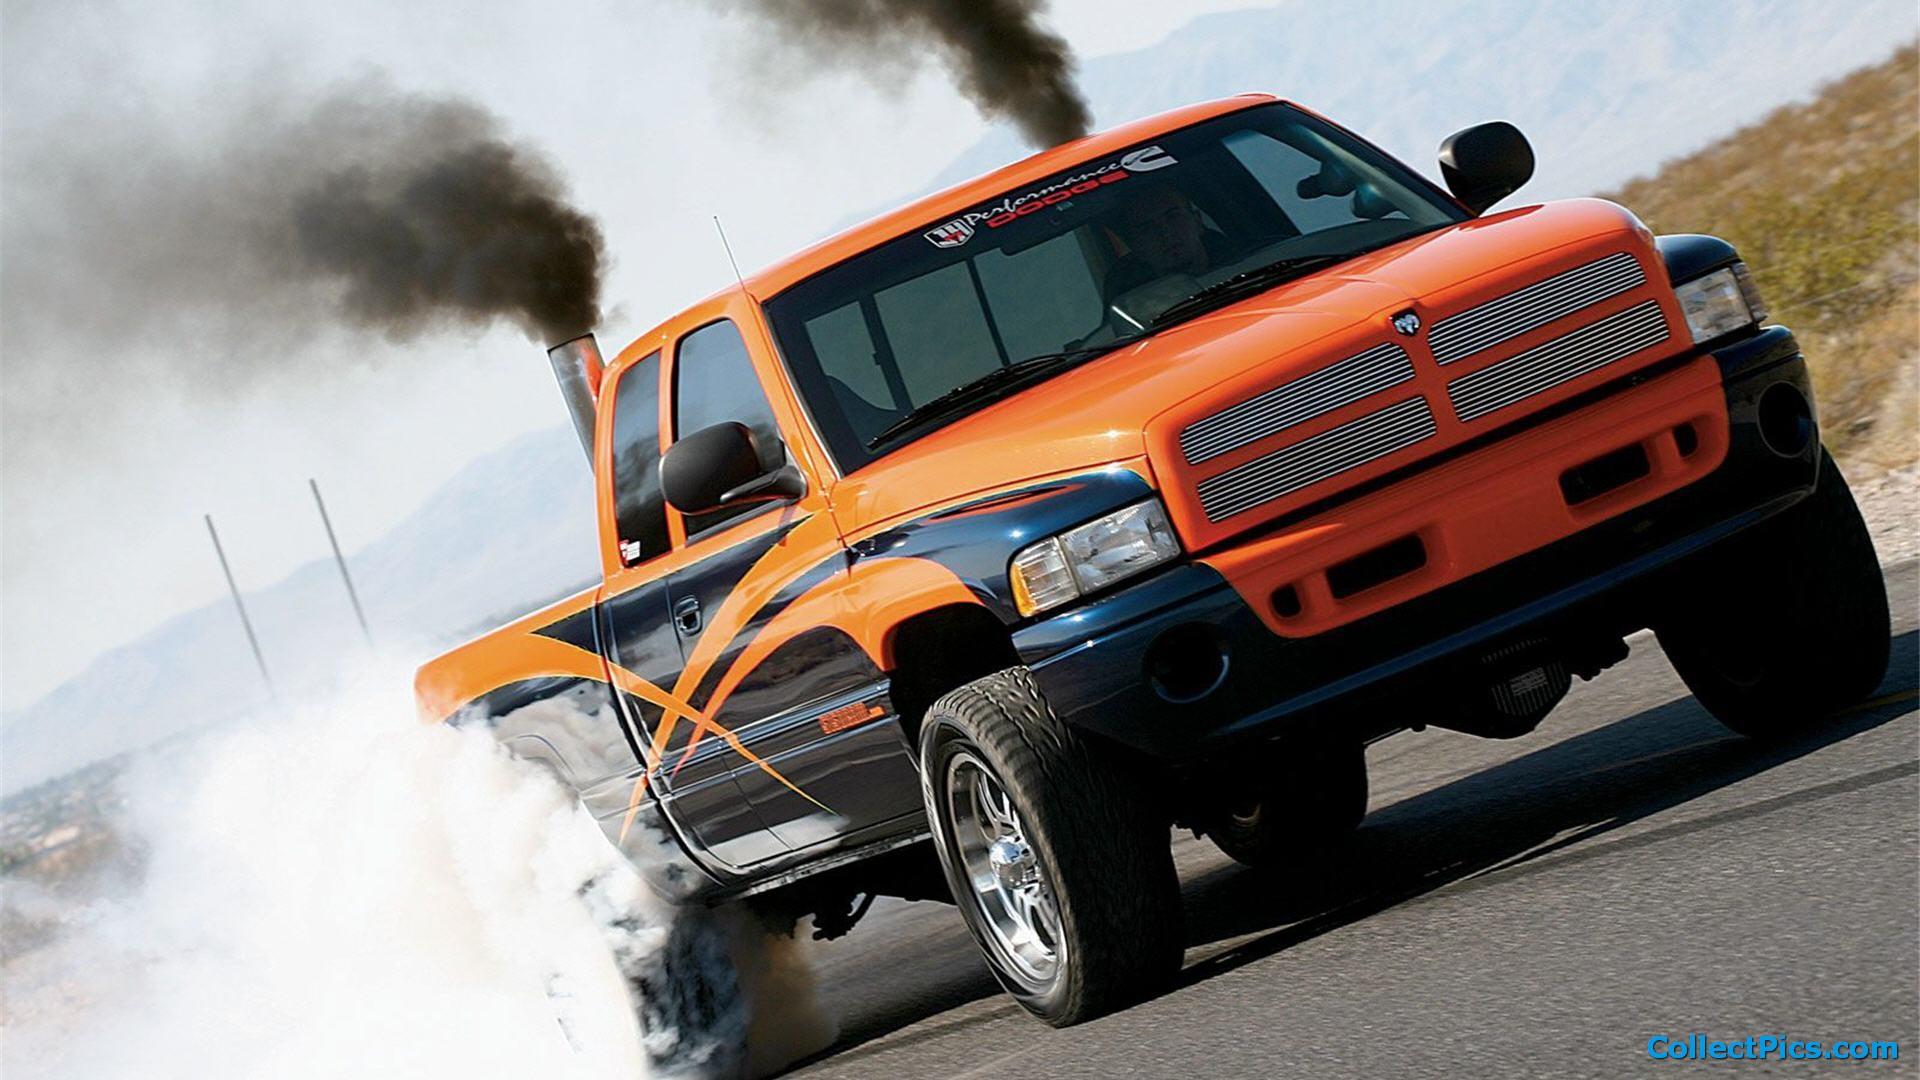 2014 Chevy Silverado Lifted >> Diesel Truck Wallpaper - WallpaperSafari